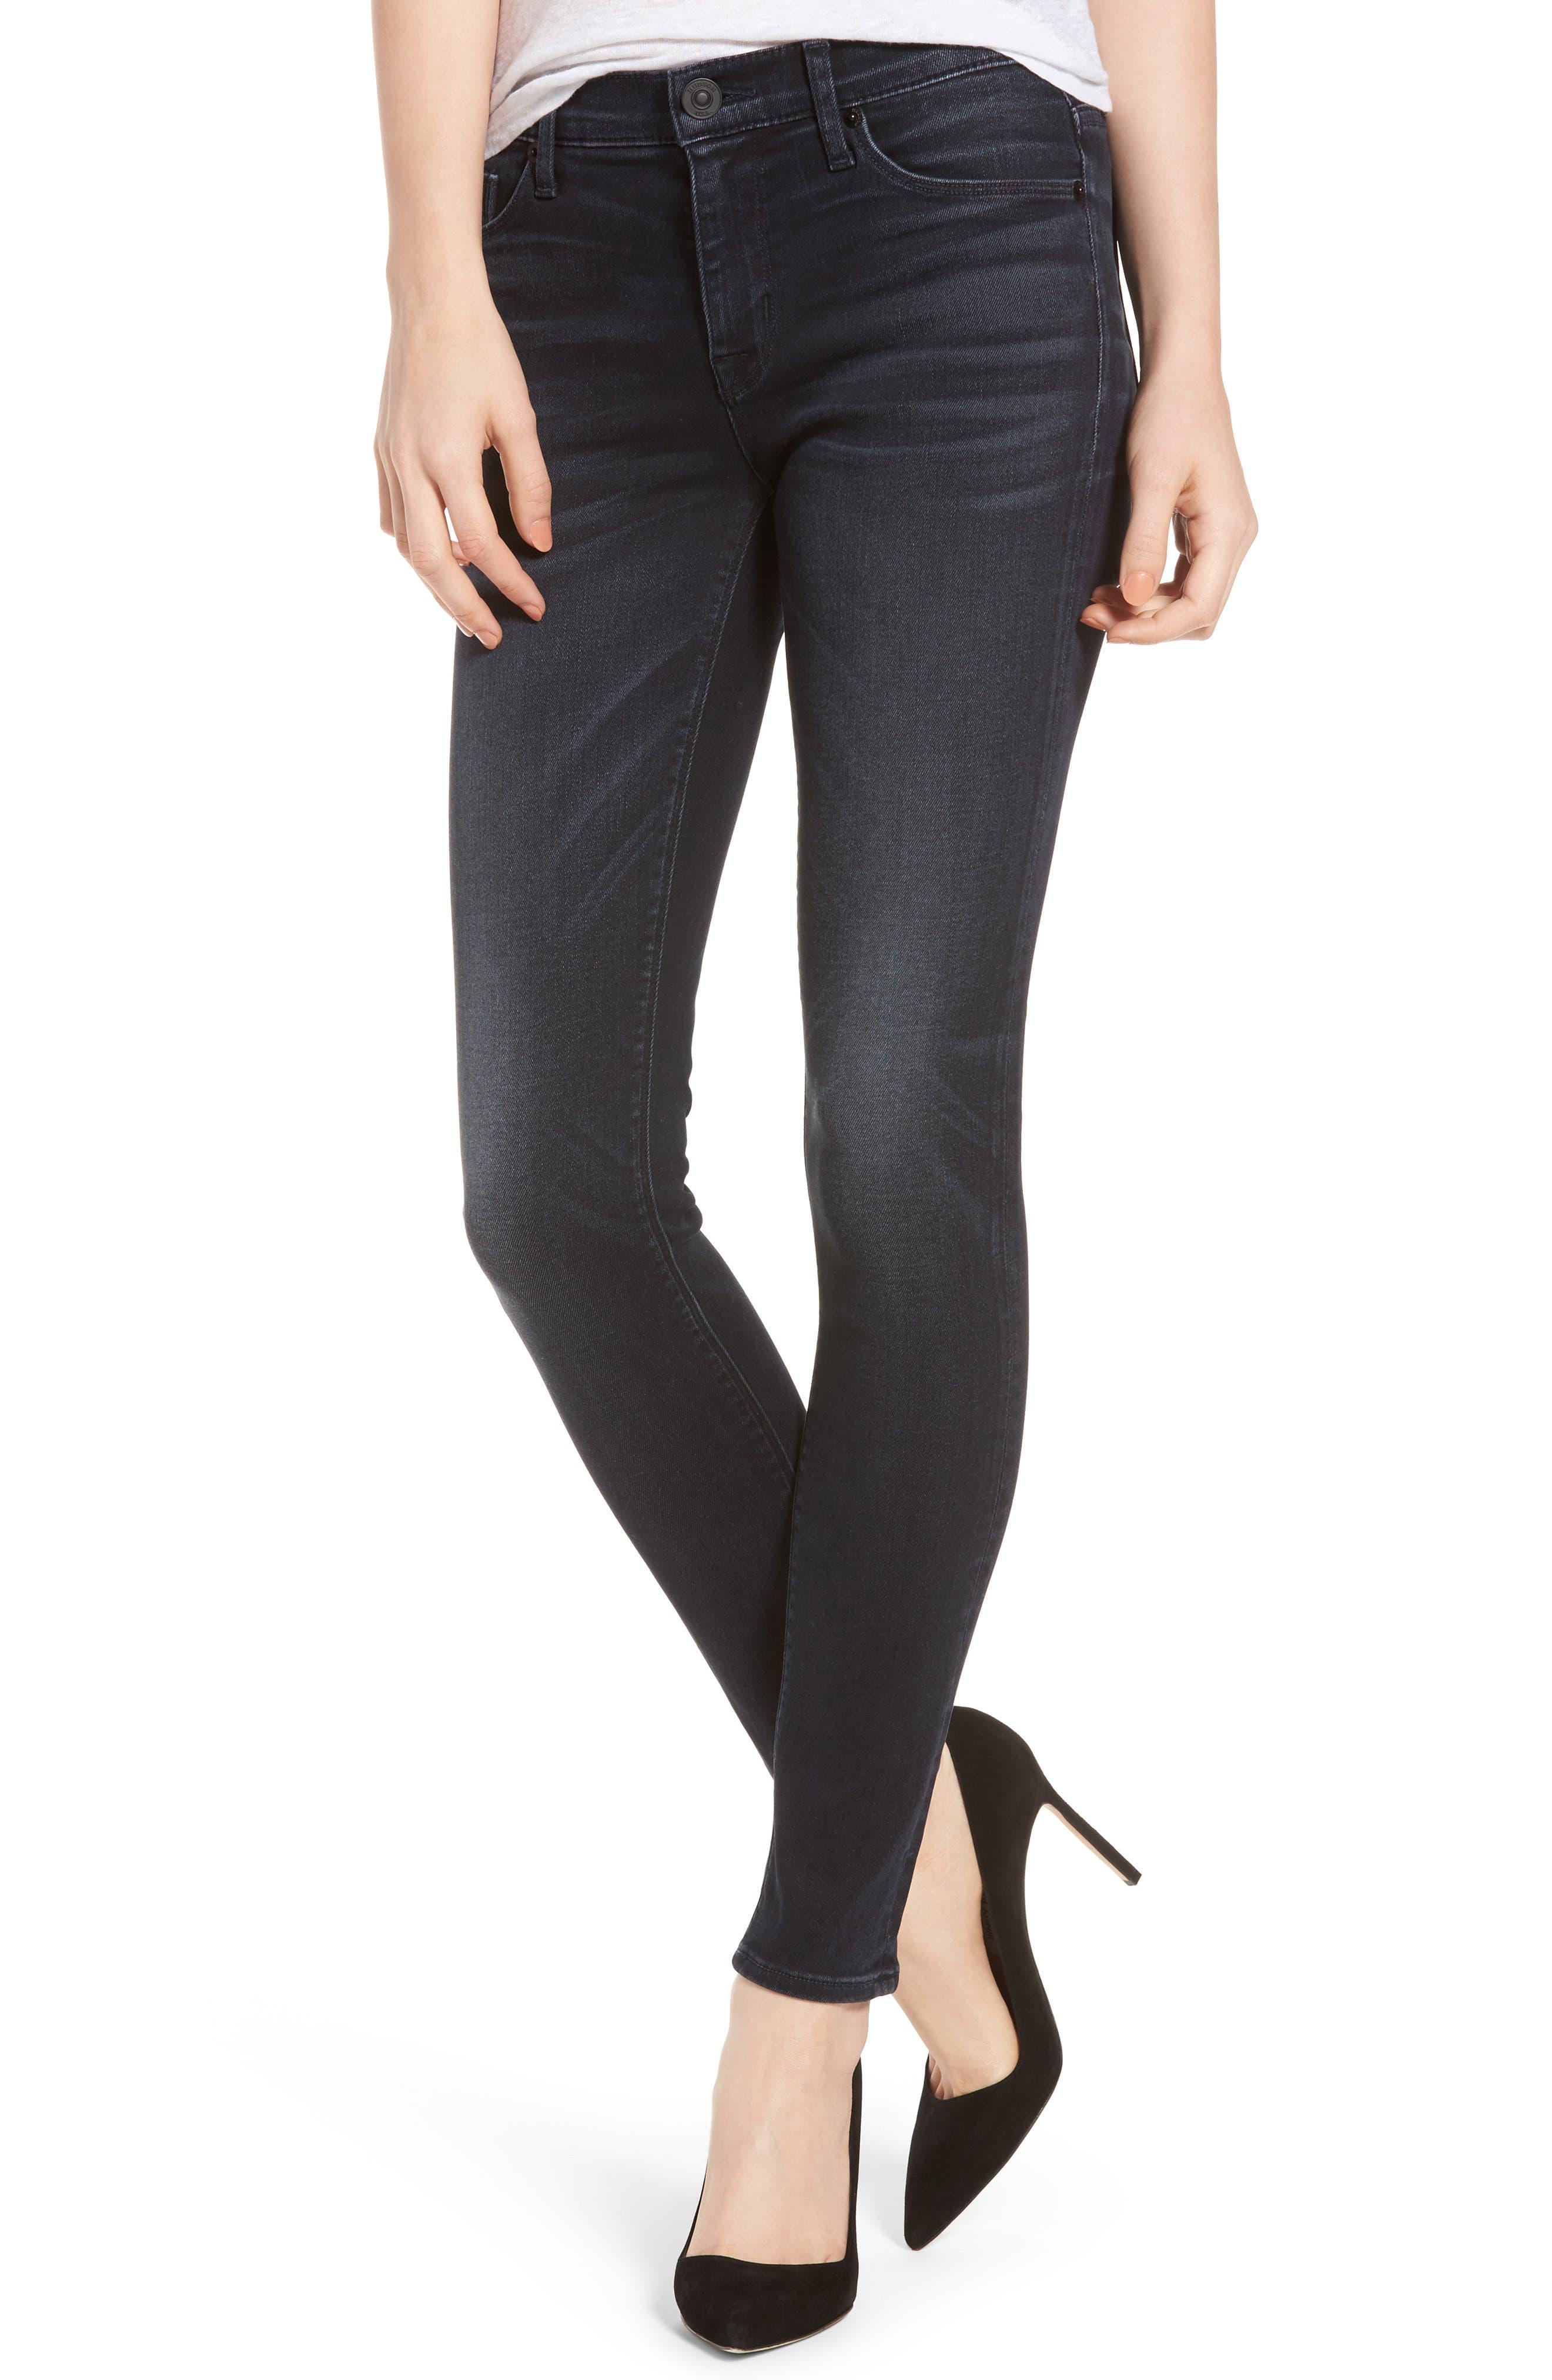 Main Image - Hudson Jeans Nico Super Skinny Jeans (Soft Shock)